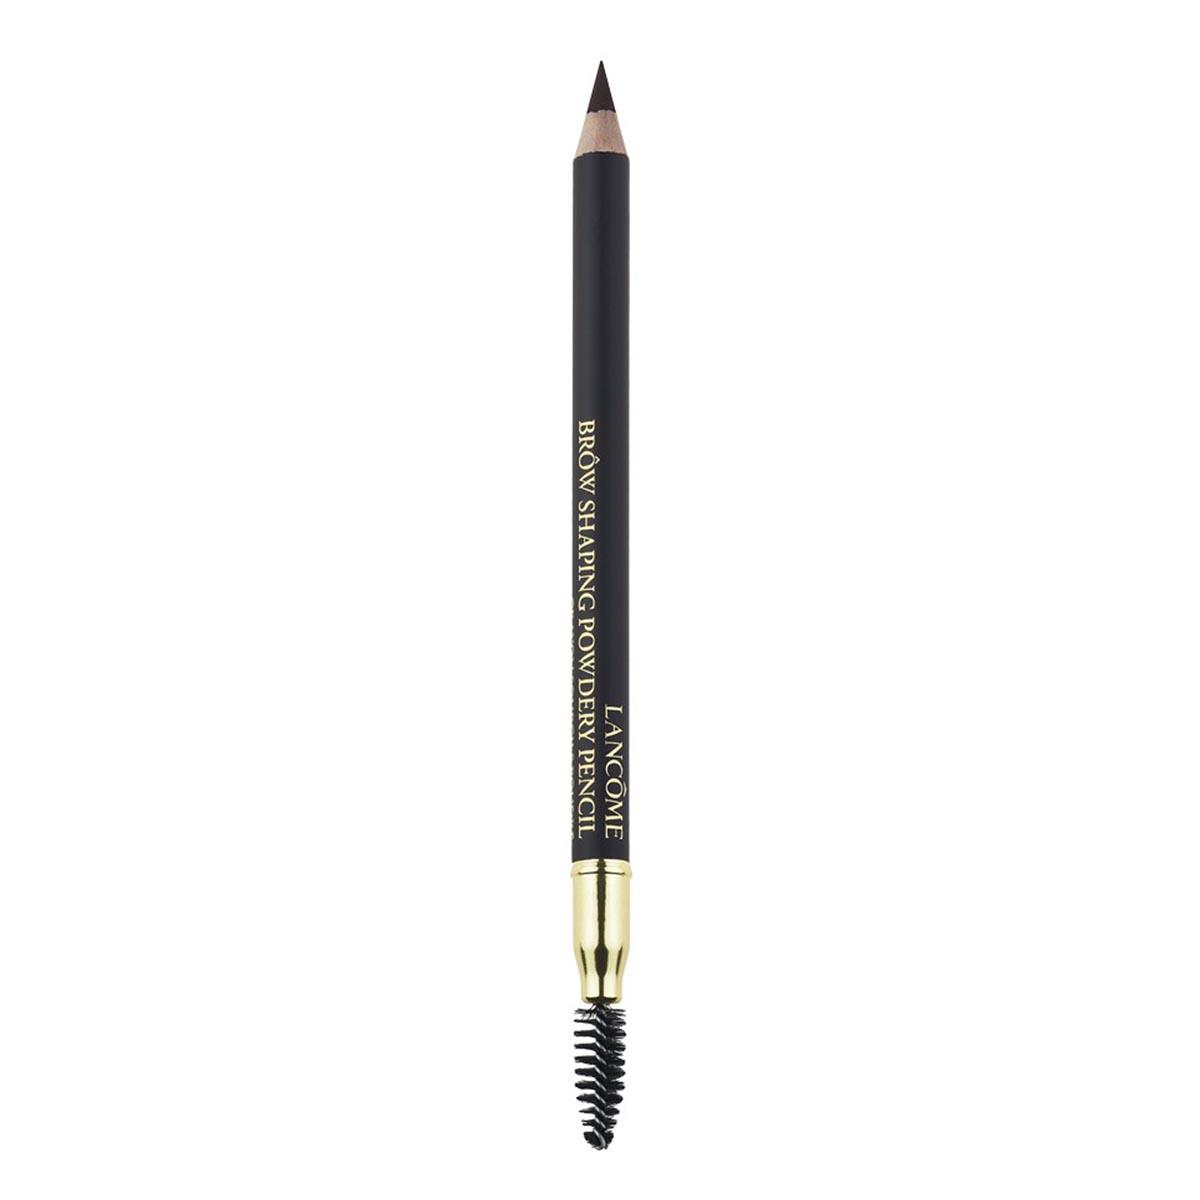 Lancome brow shaping powdery pencil 09 soft black